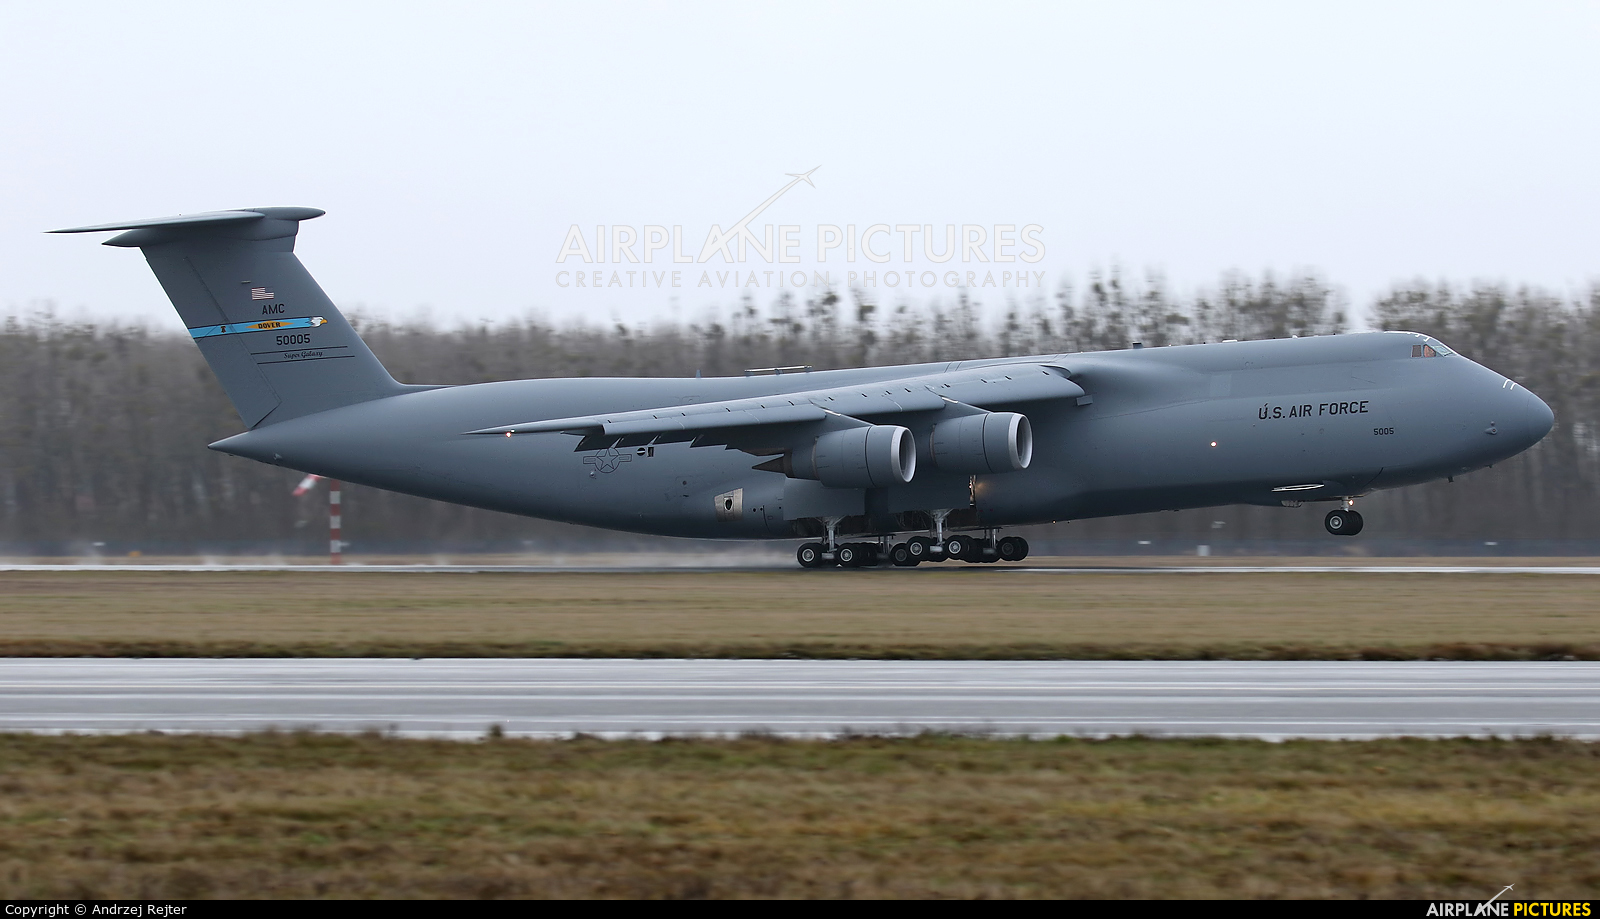 USA - Air Force 85-0005 aircraft at Wrocław - Copernicus